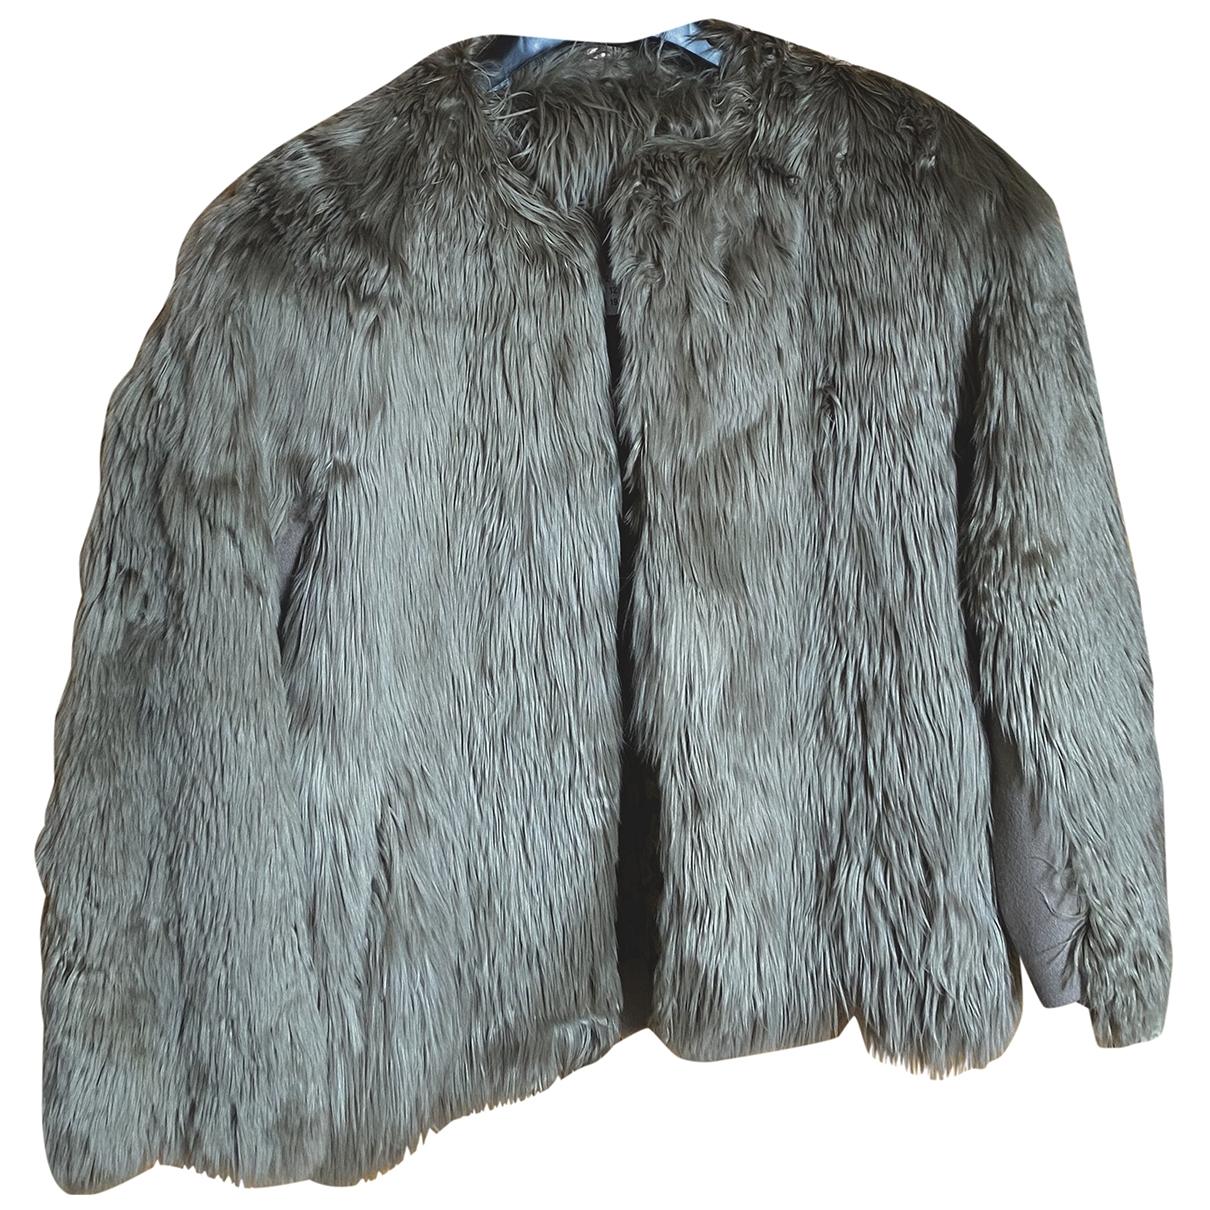 Maison Martin Margiela \N Grey Fur jacket for Women 42 IT